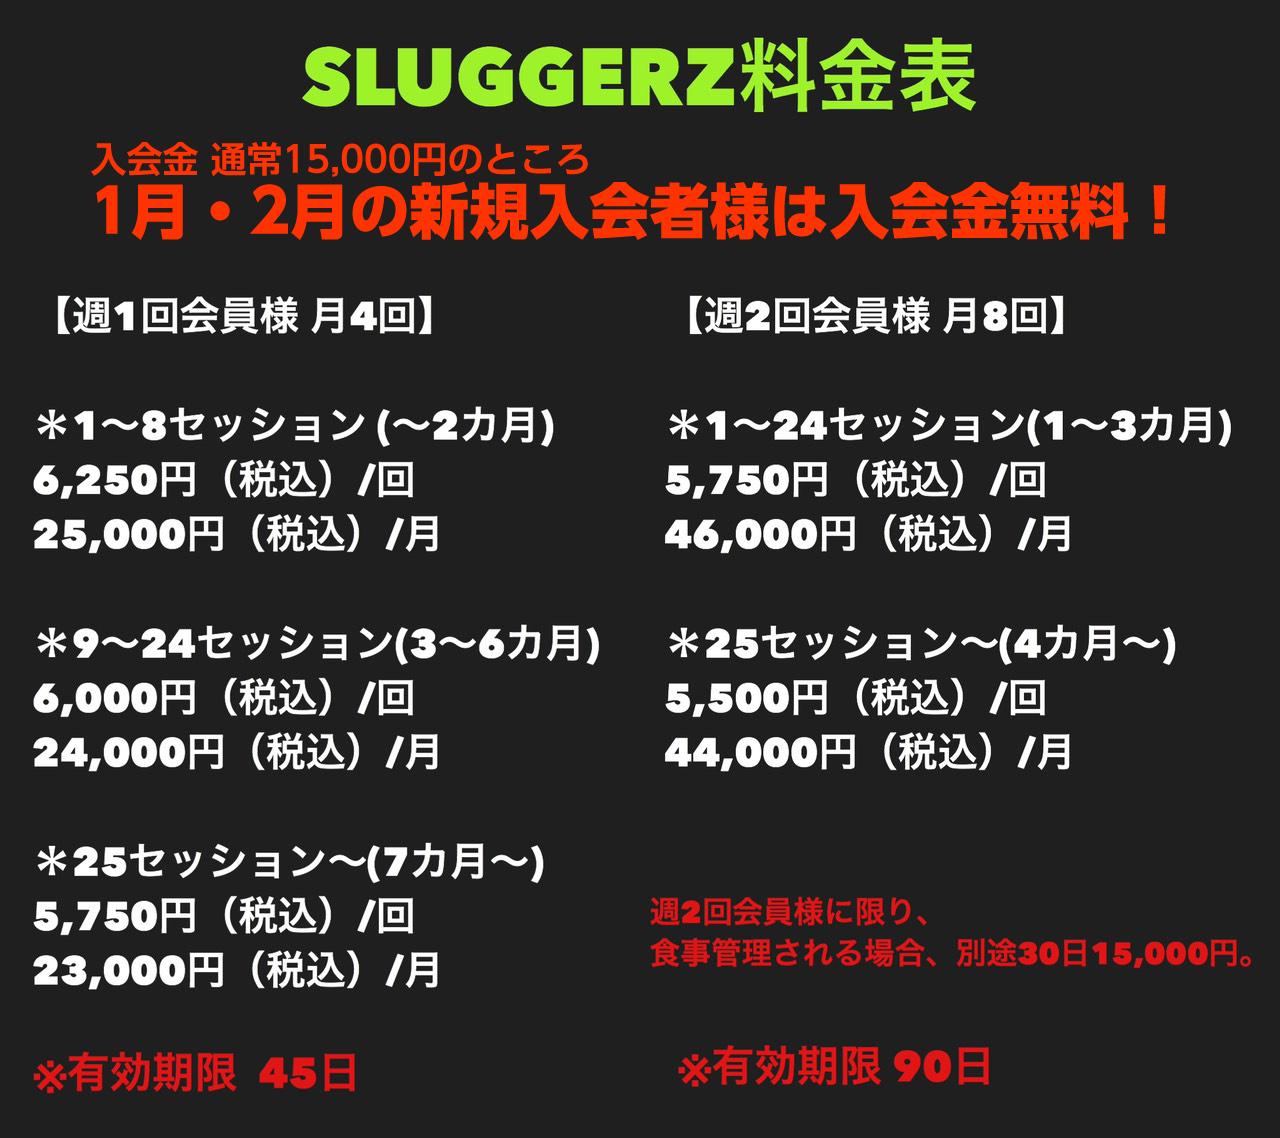 ad_sluggerz